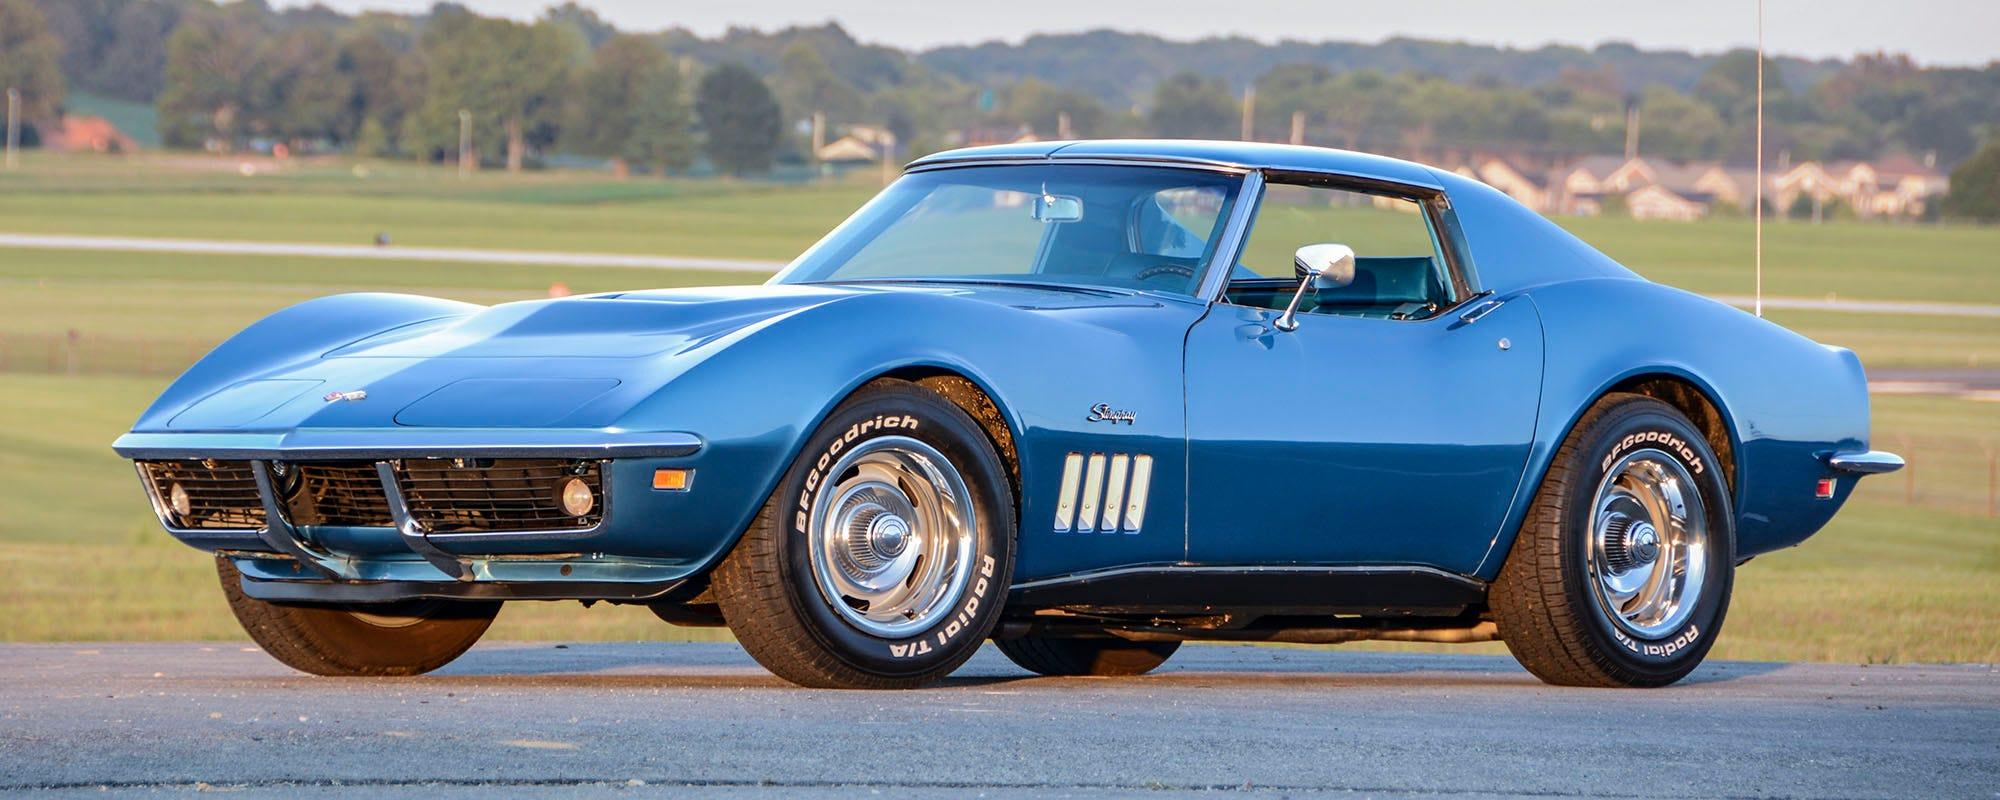 1969 Chevrolet Corvette Stingray with BF Goodrich Radial T/A Raised White Letter tires.